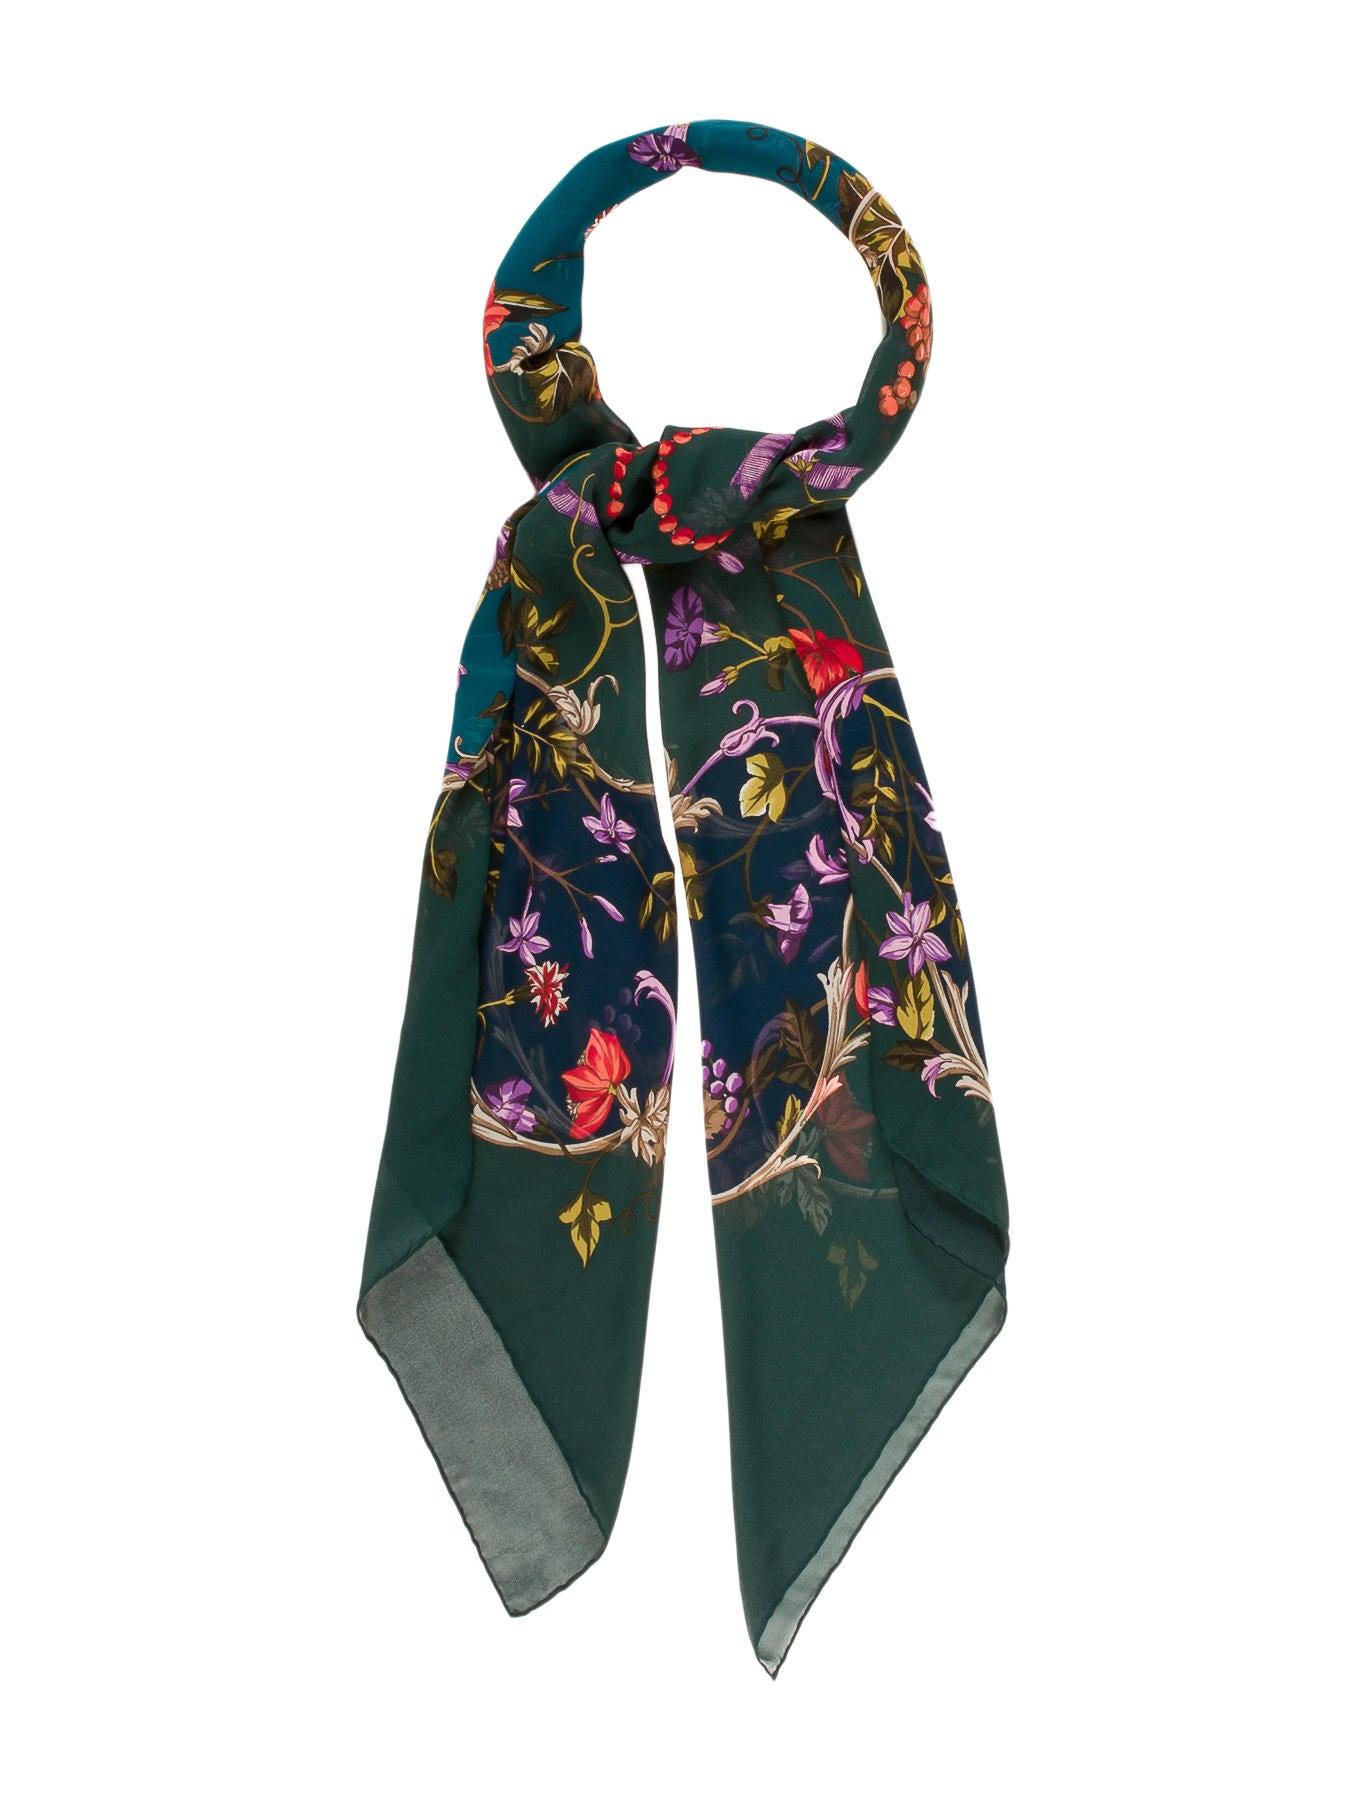 gucci printed chiffon scarf accessories guc137889